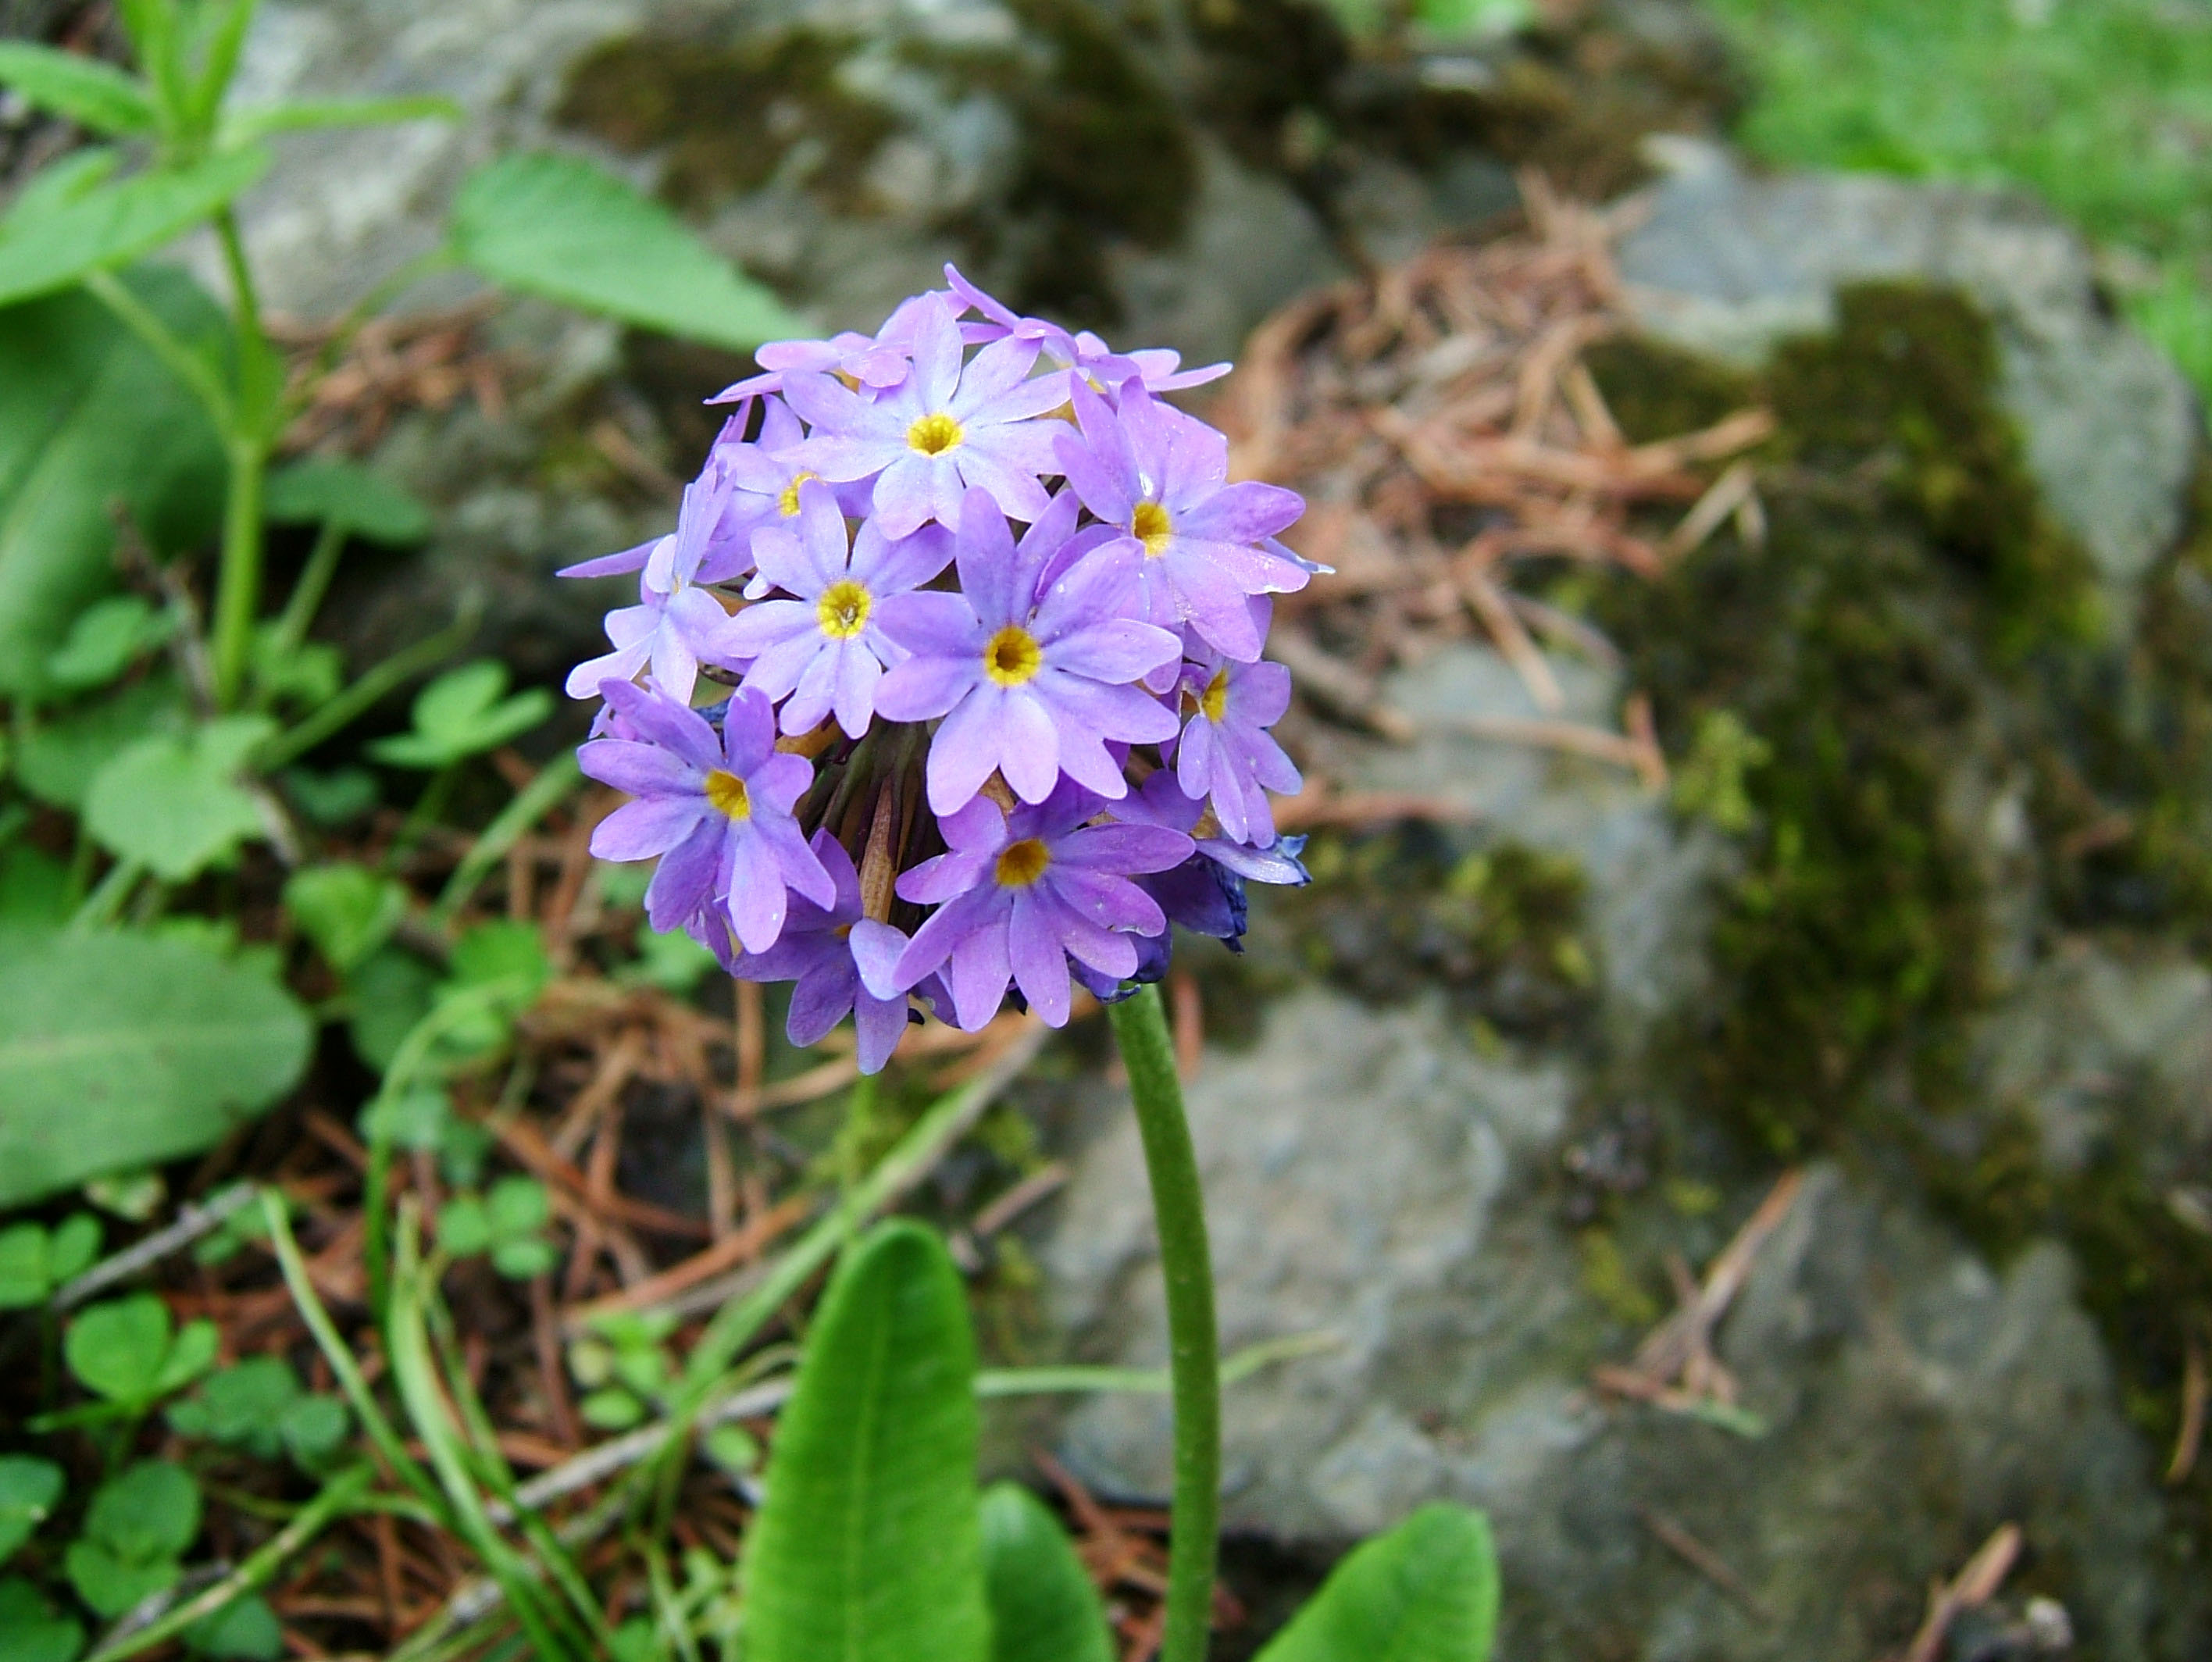 Local Wild spring flowers Srinagar Kashmir India 10